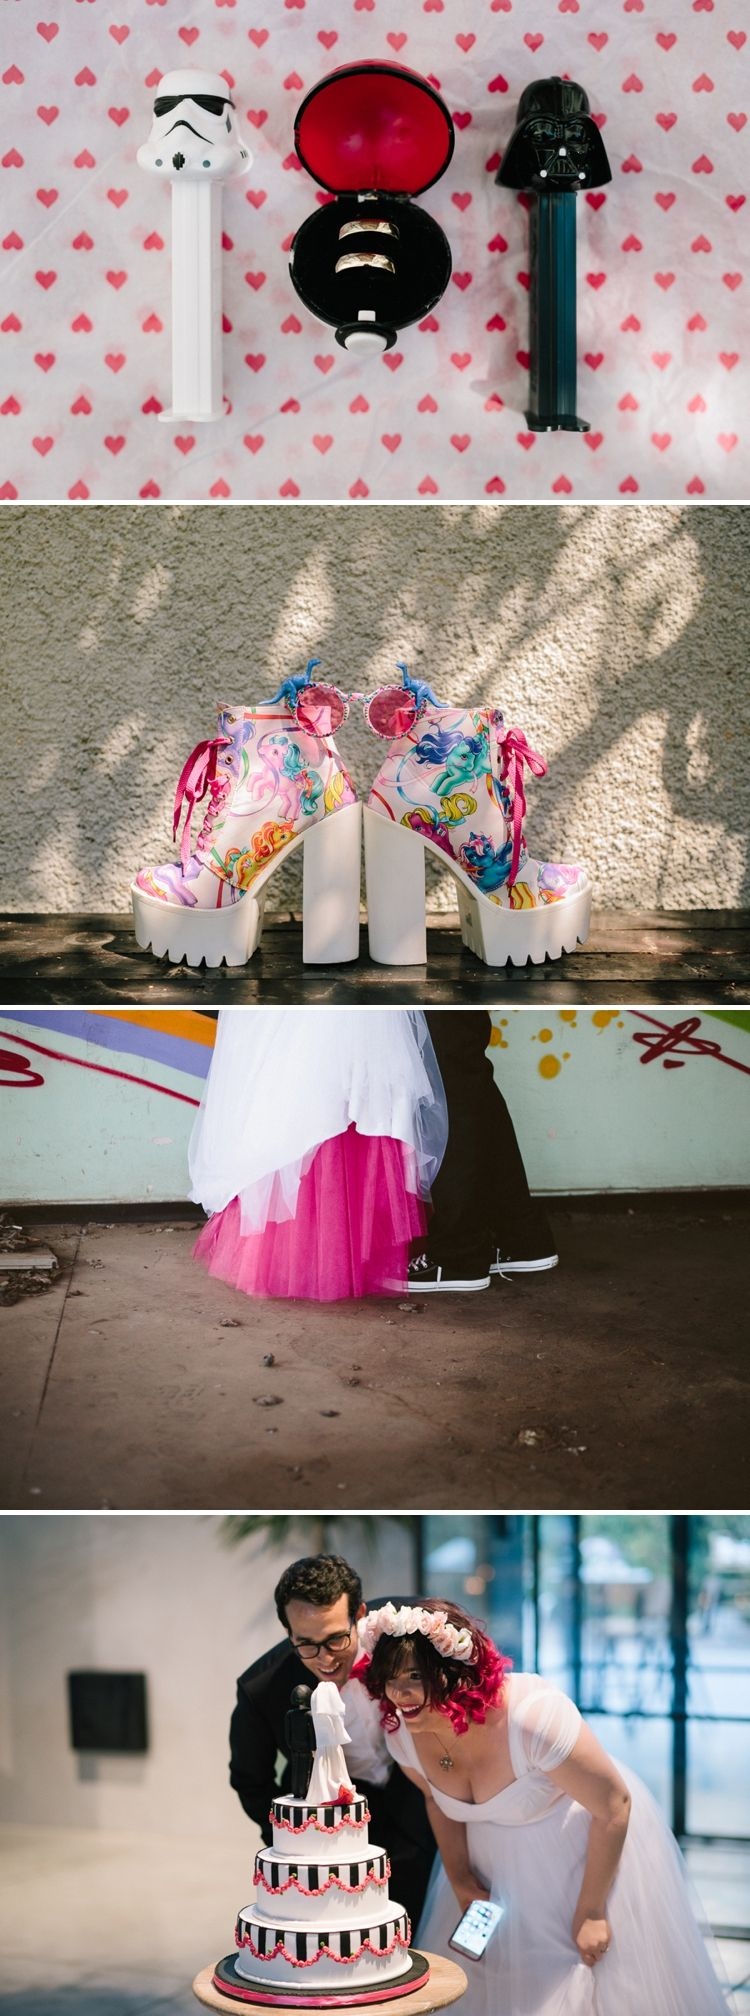 Star Wars and Pokemon / A Pink 'geeky-fairytale' Jewish wedding / East-TLV, Tel Aviv, Israel / Photography by Noa Magger / http://www.smashingtheglass.com/2016/06/28/pink-geeky-fairytale-jewish-wedding-east-tlv-tel-aviv-israel/